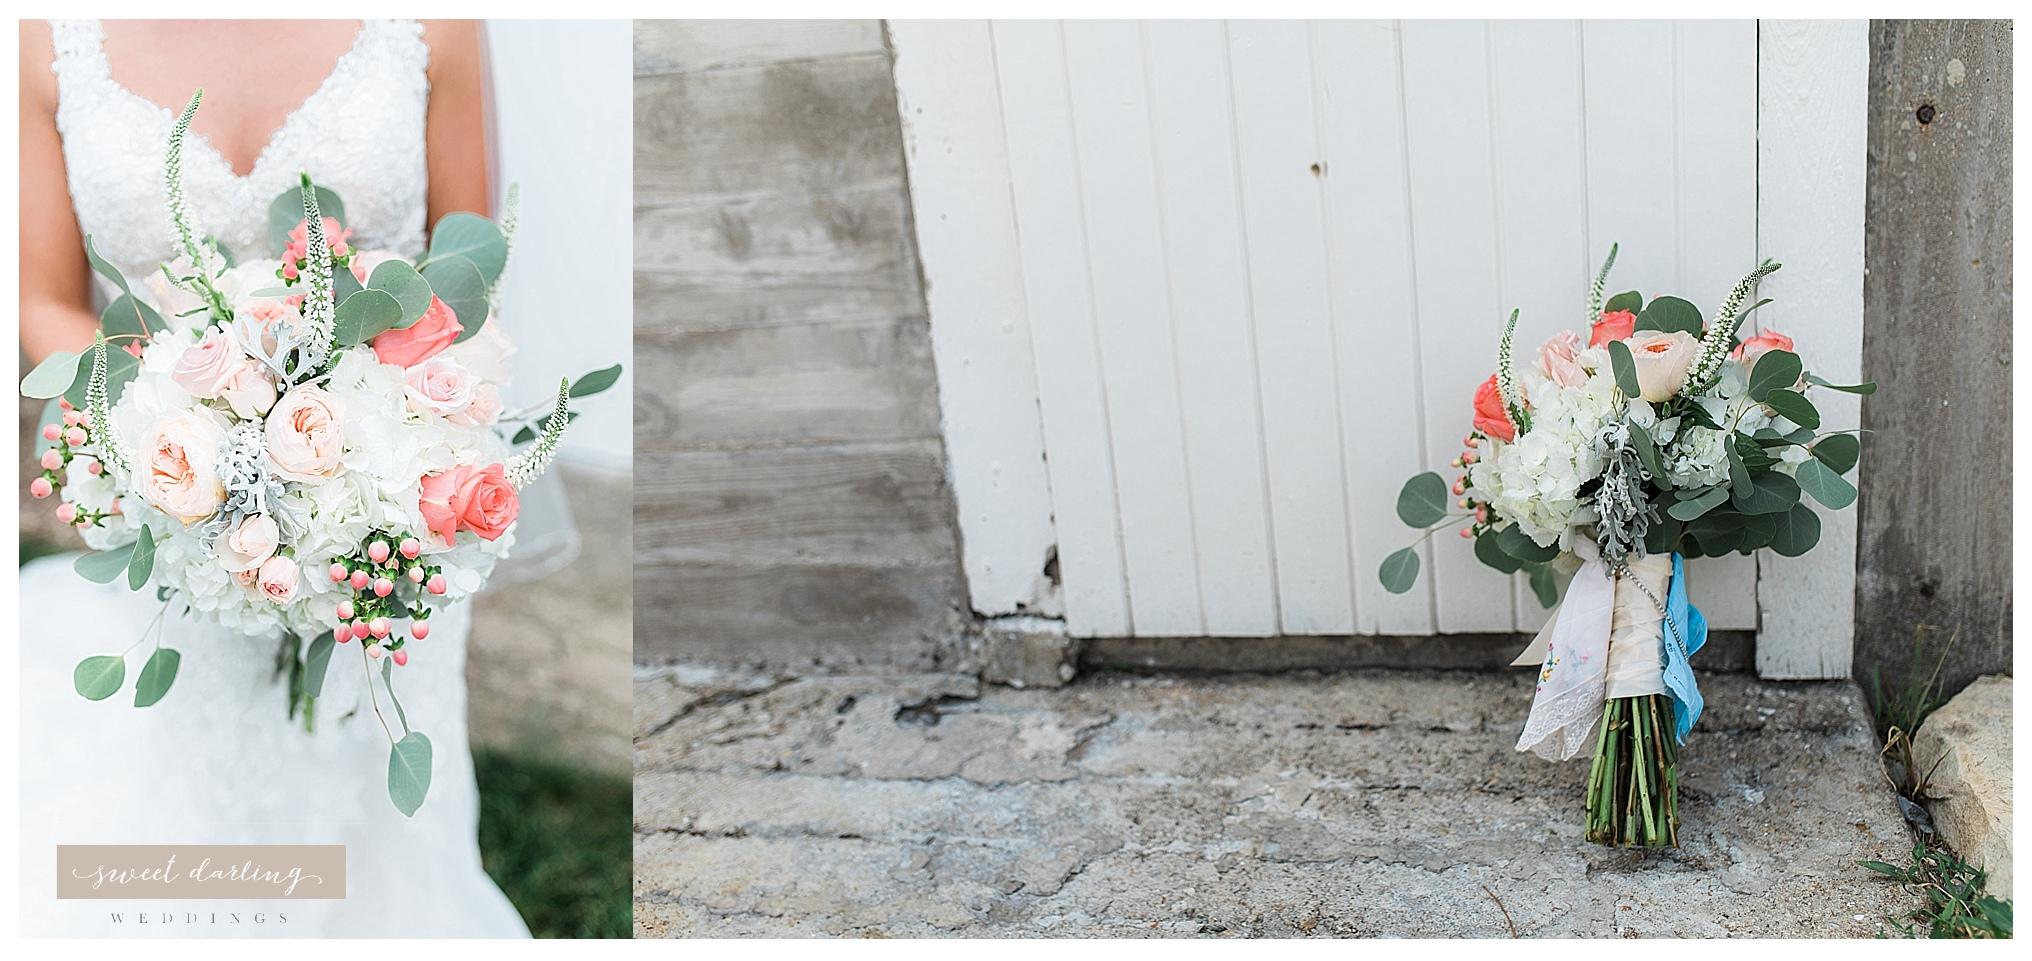 Paxton-illinois-engelbrecht-farmstead-romantic-wedding-photographer-sweet-darling-weddings_1209.jpg